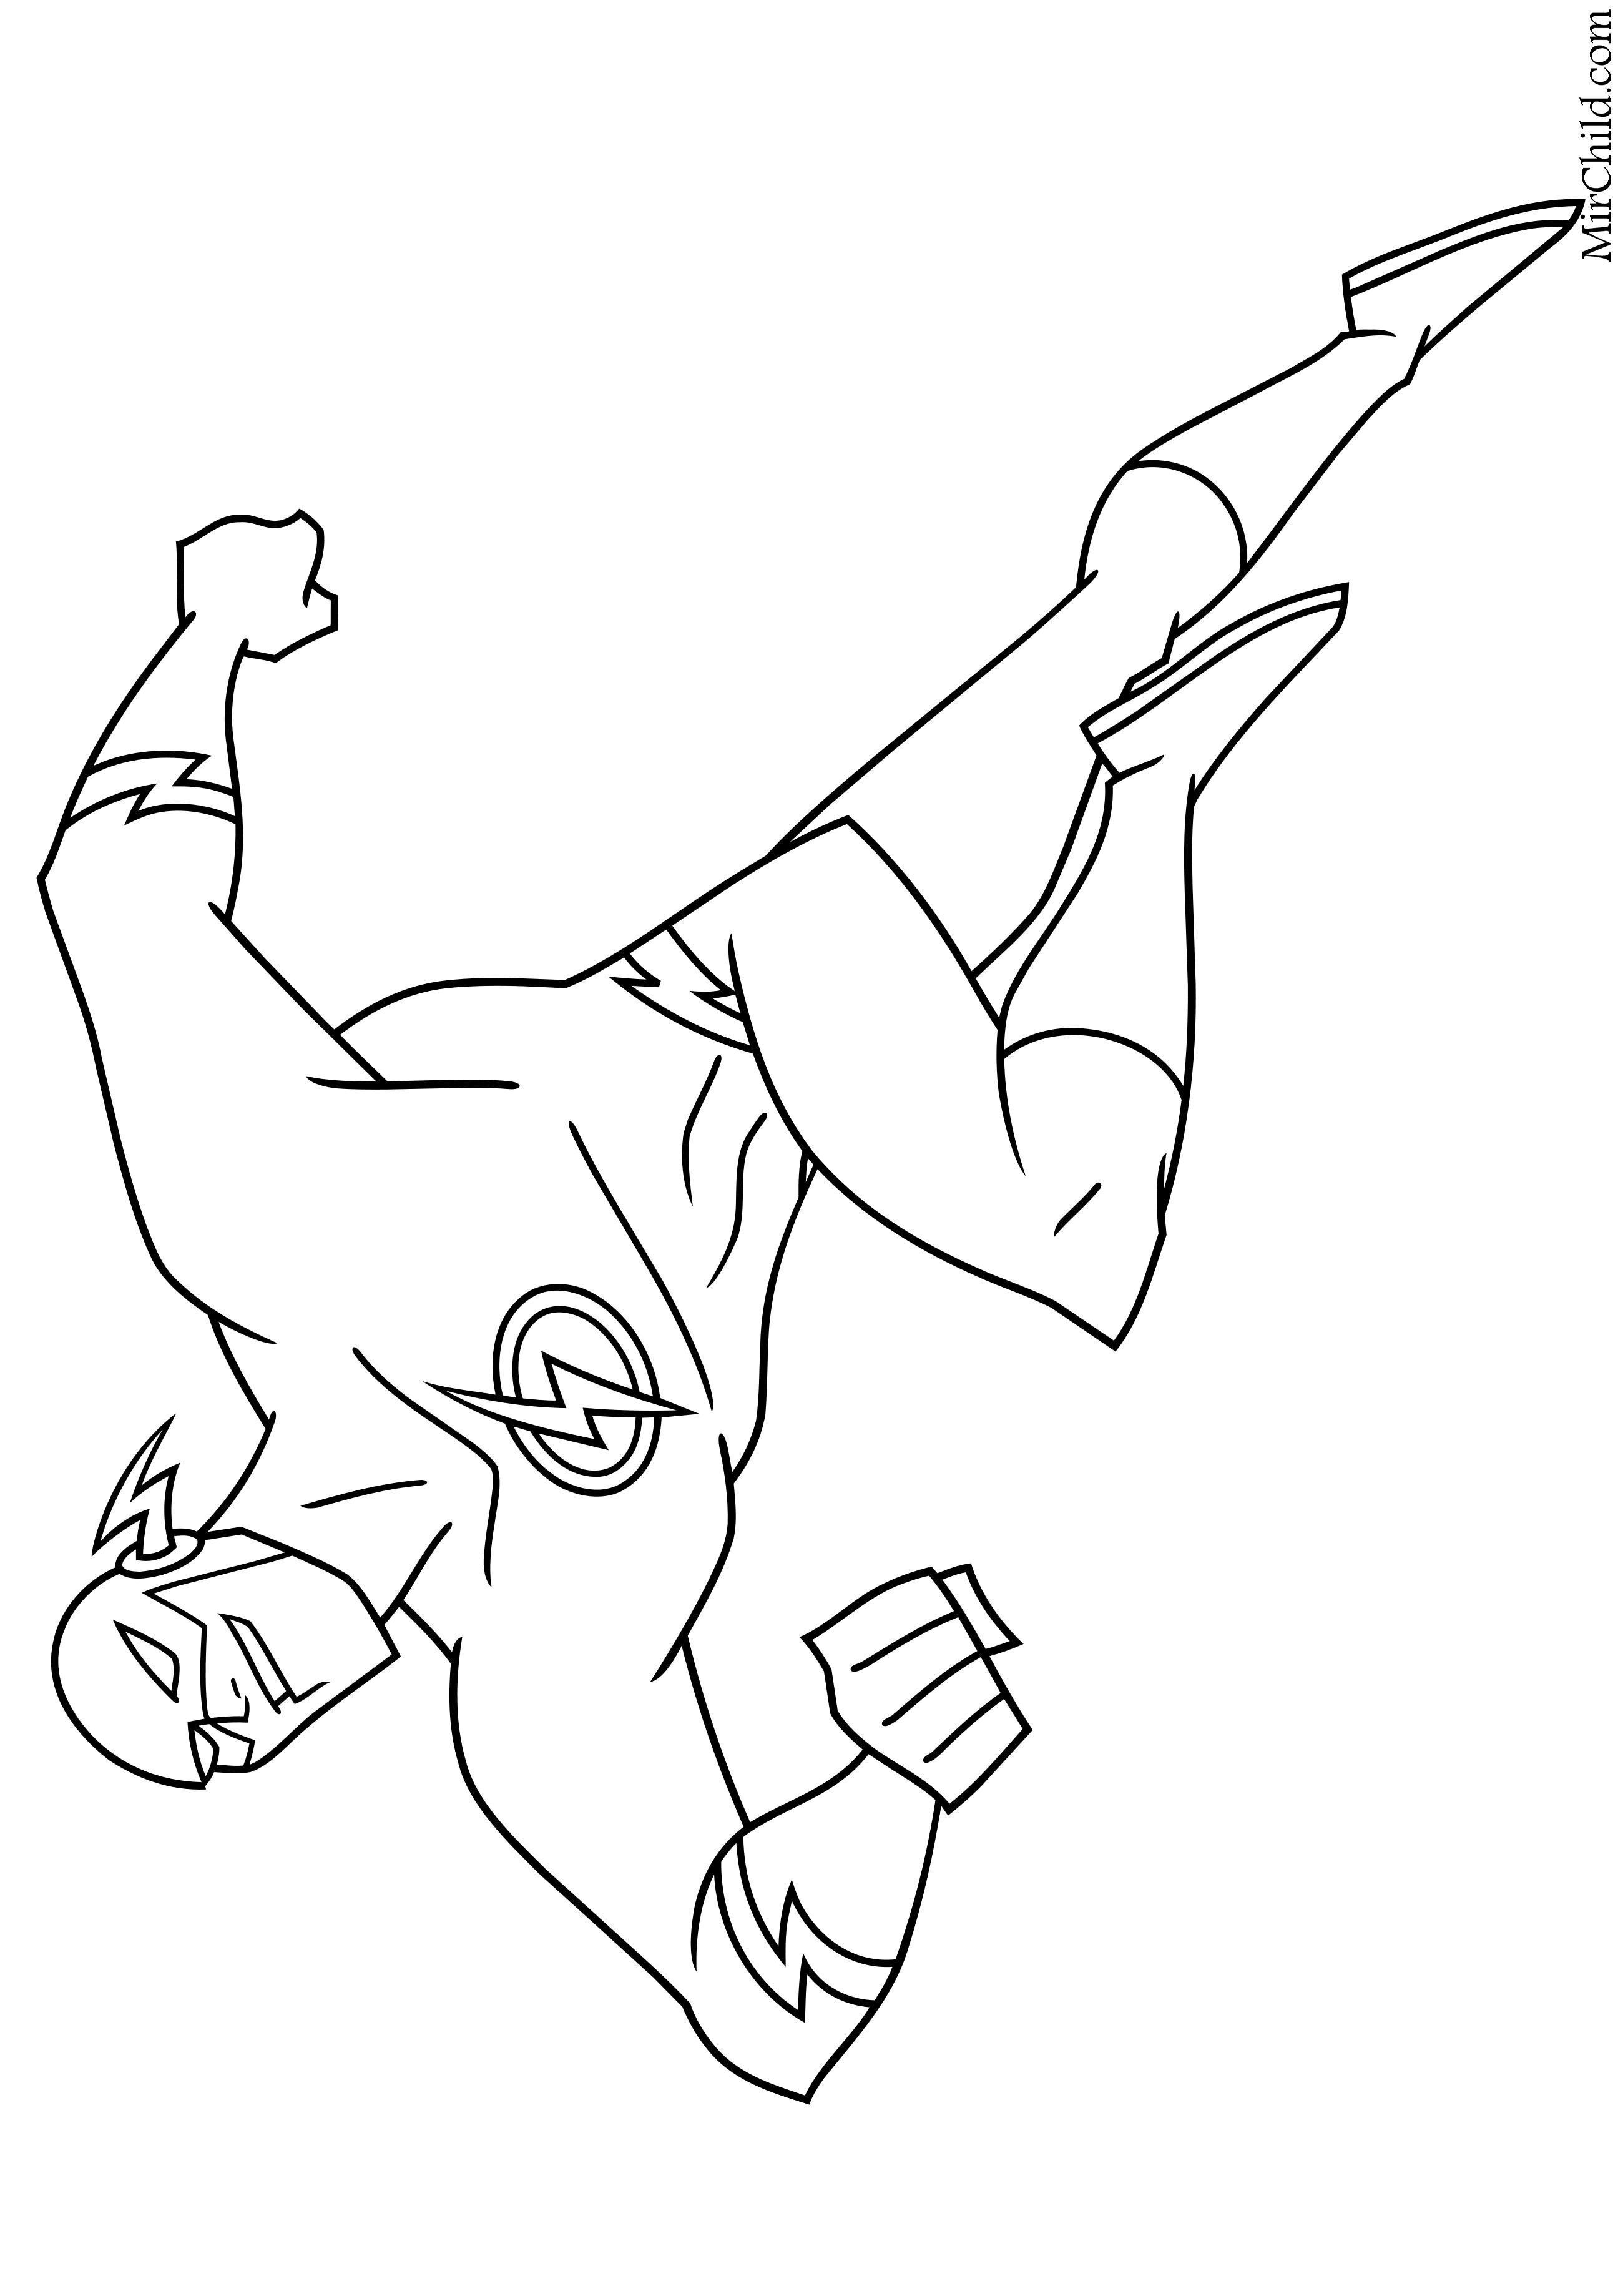 Раскраска флэш скачать